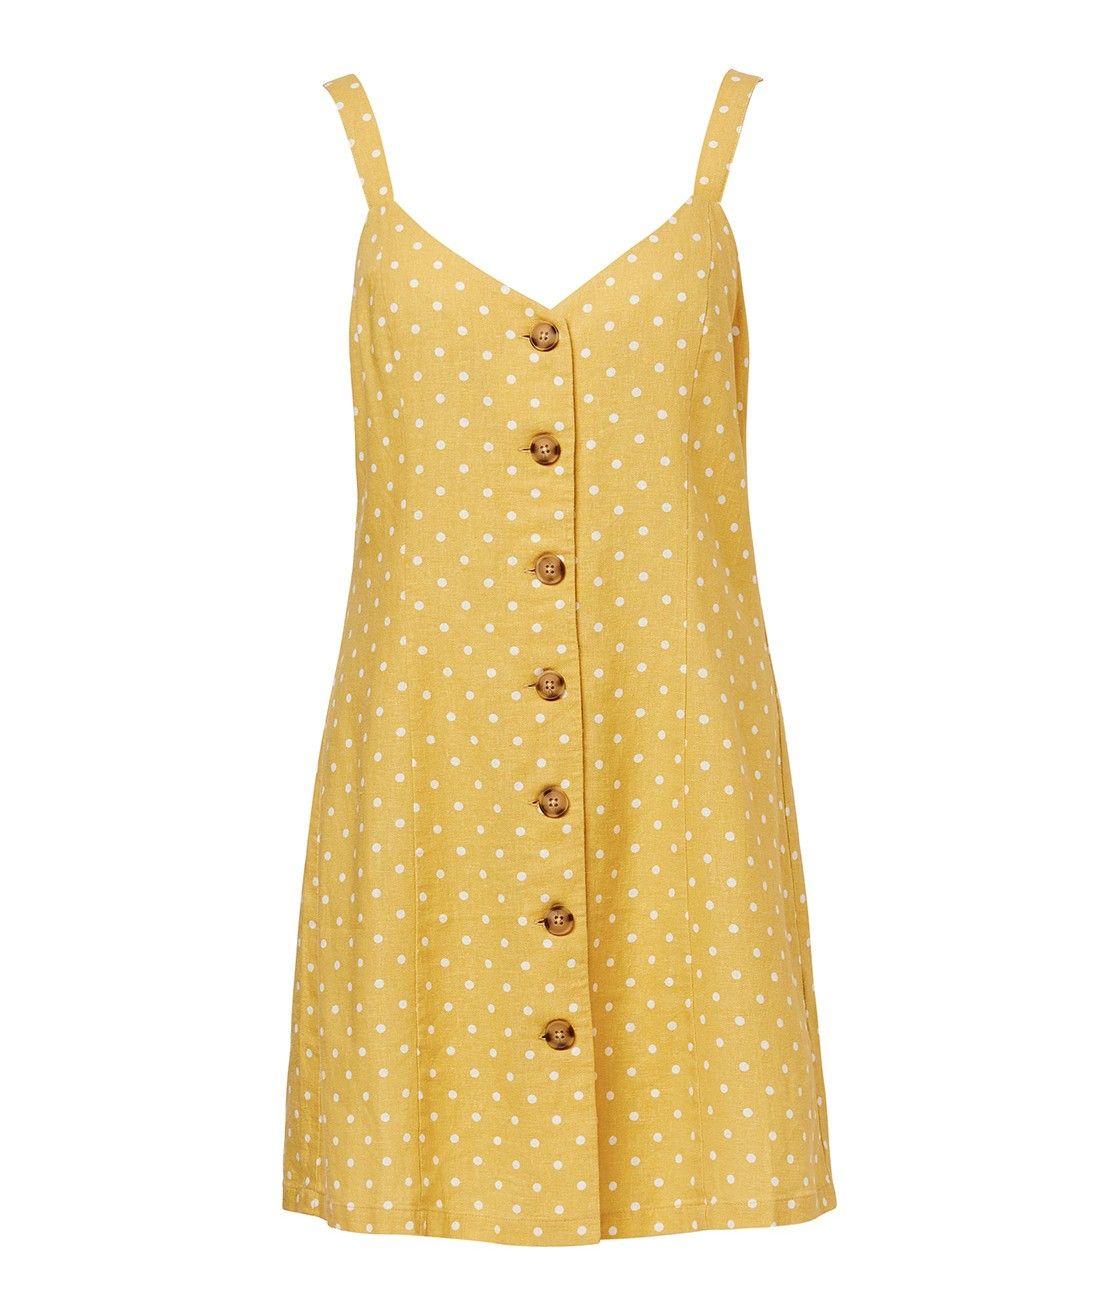 5afb6c12e5c Linen Edit - Spot Linen Button Front Mini Dress - Clothing - Sportsgirl